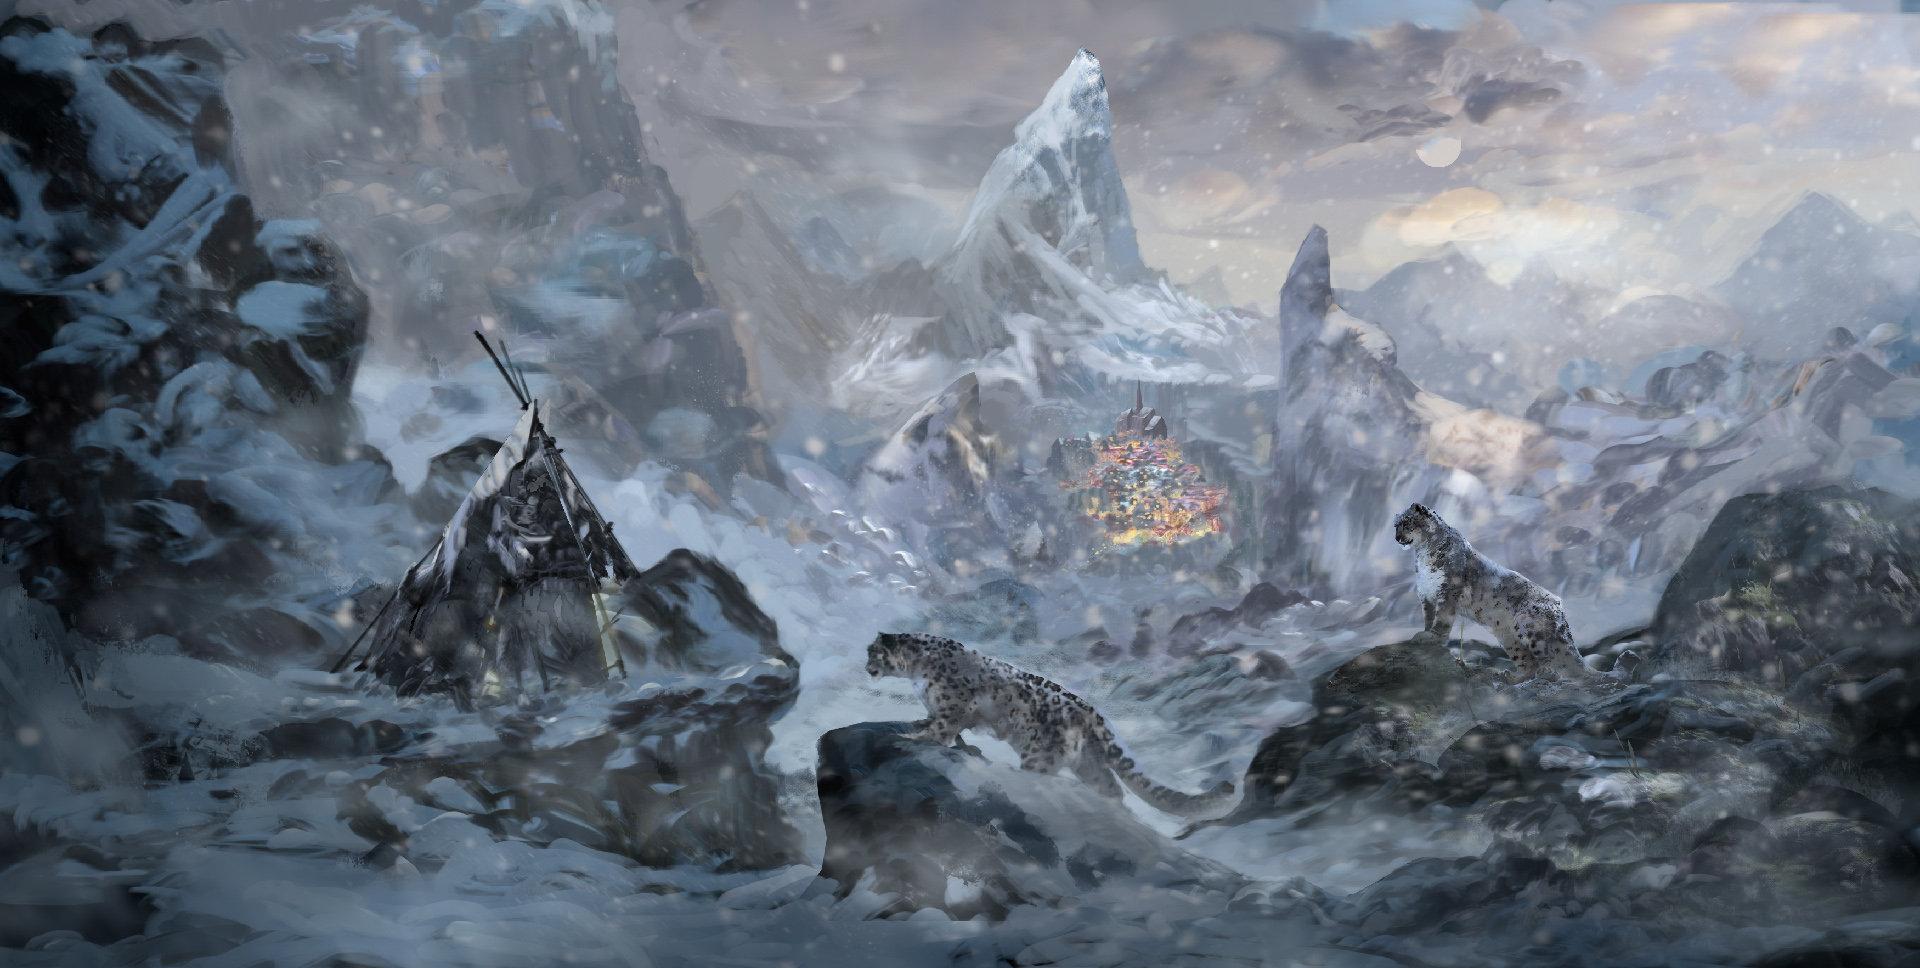 Jack eaves mountain concept 02